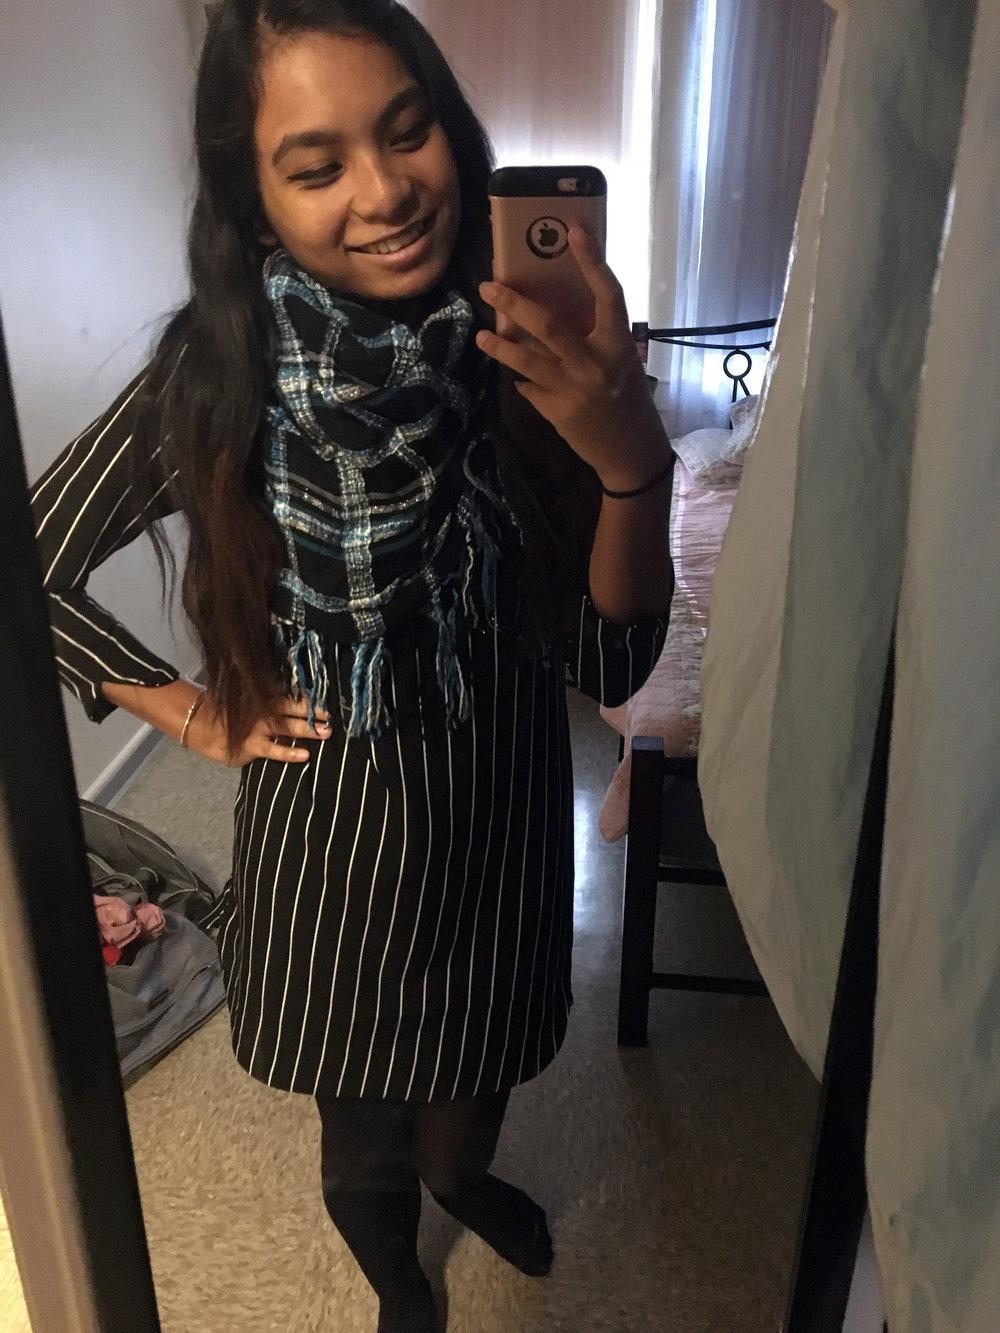 Black-White-Striped-Dress-Blogger-Style-LINDATENCHITRAN-2-1080x1616.jpg